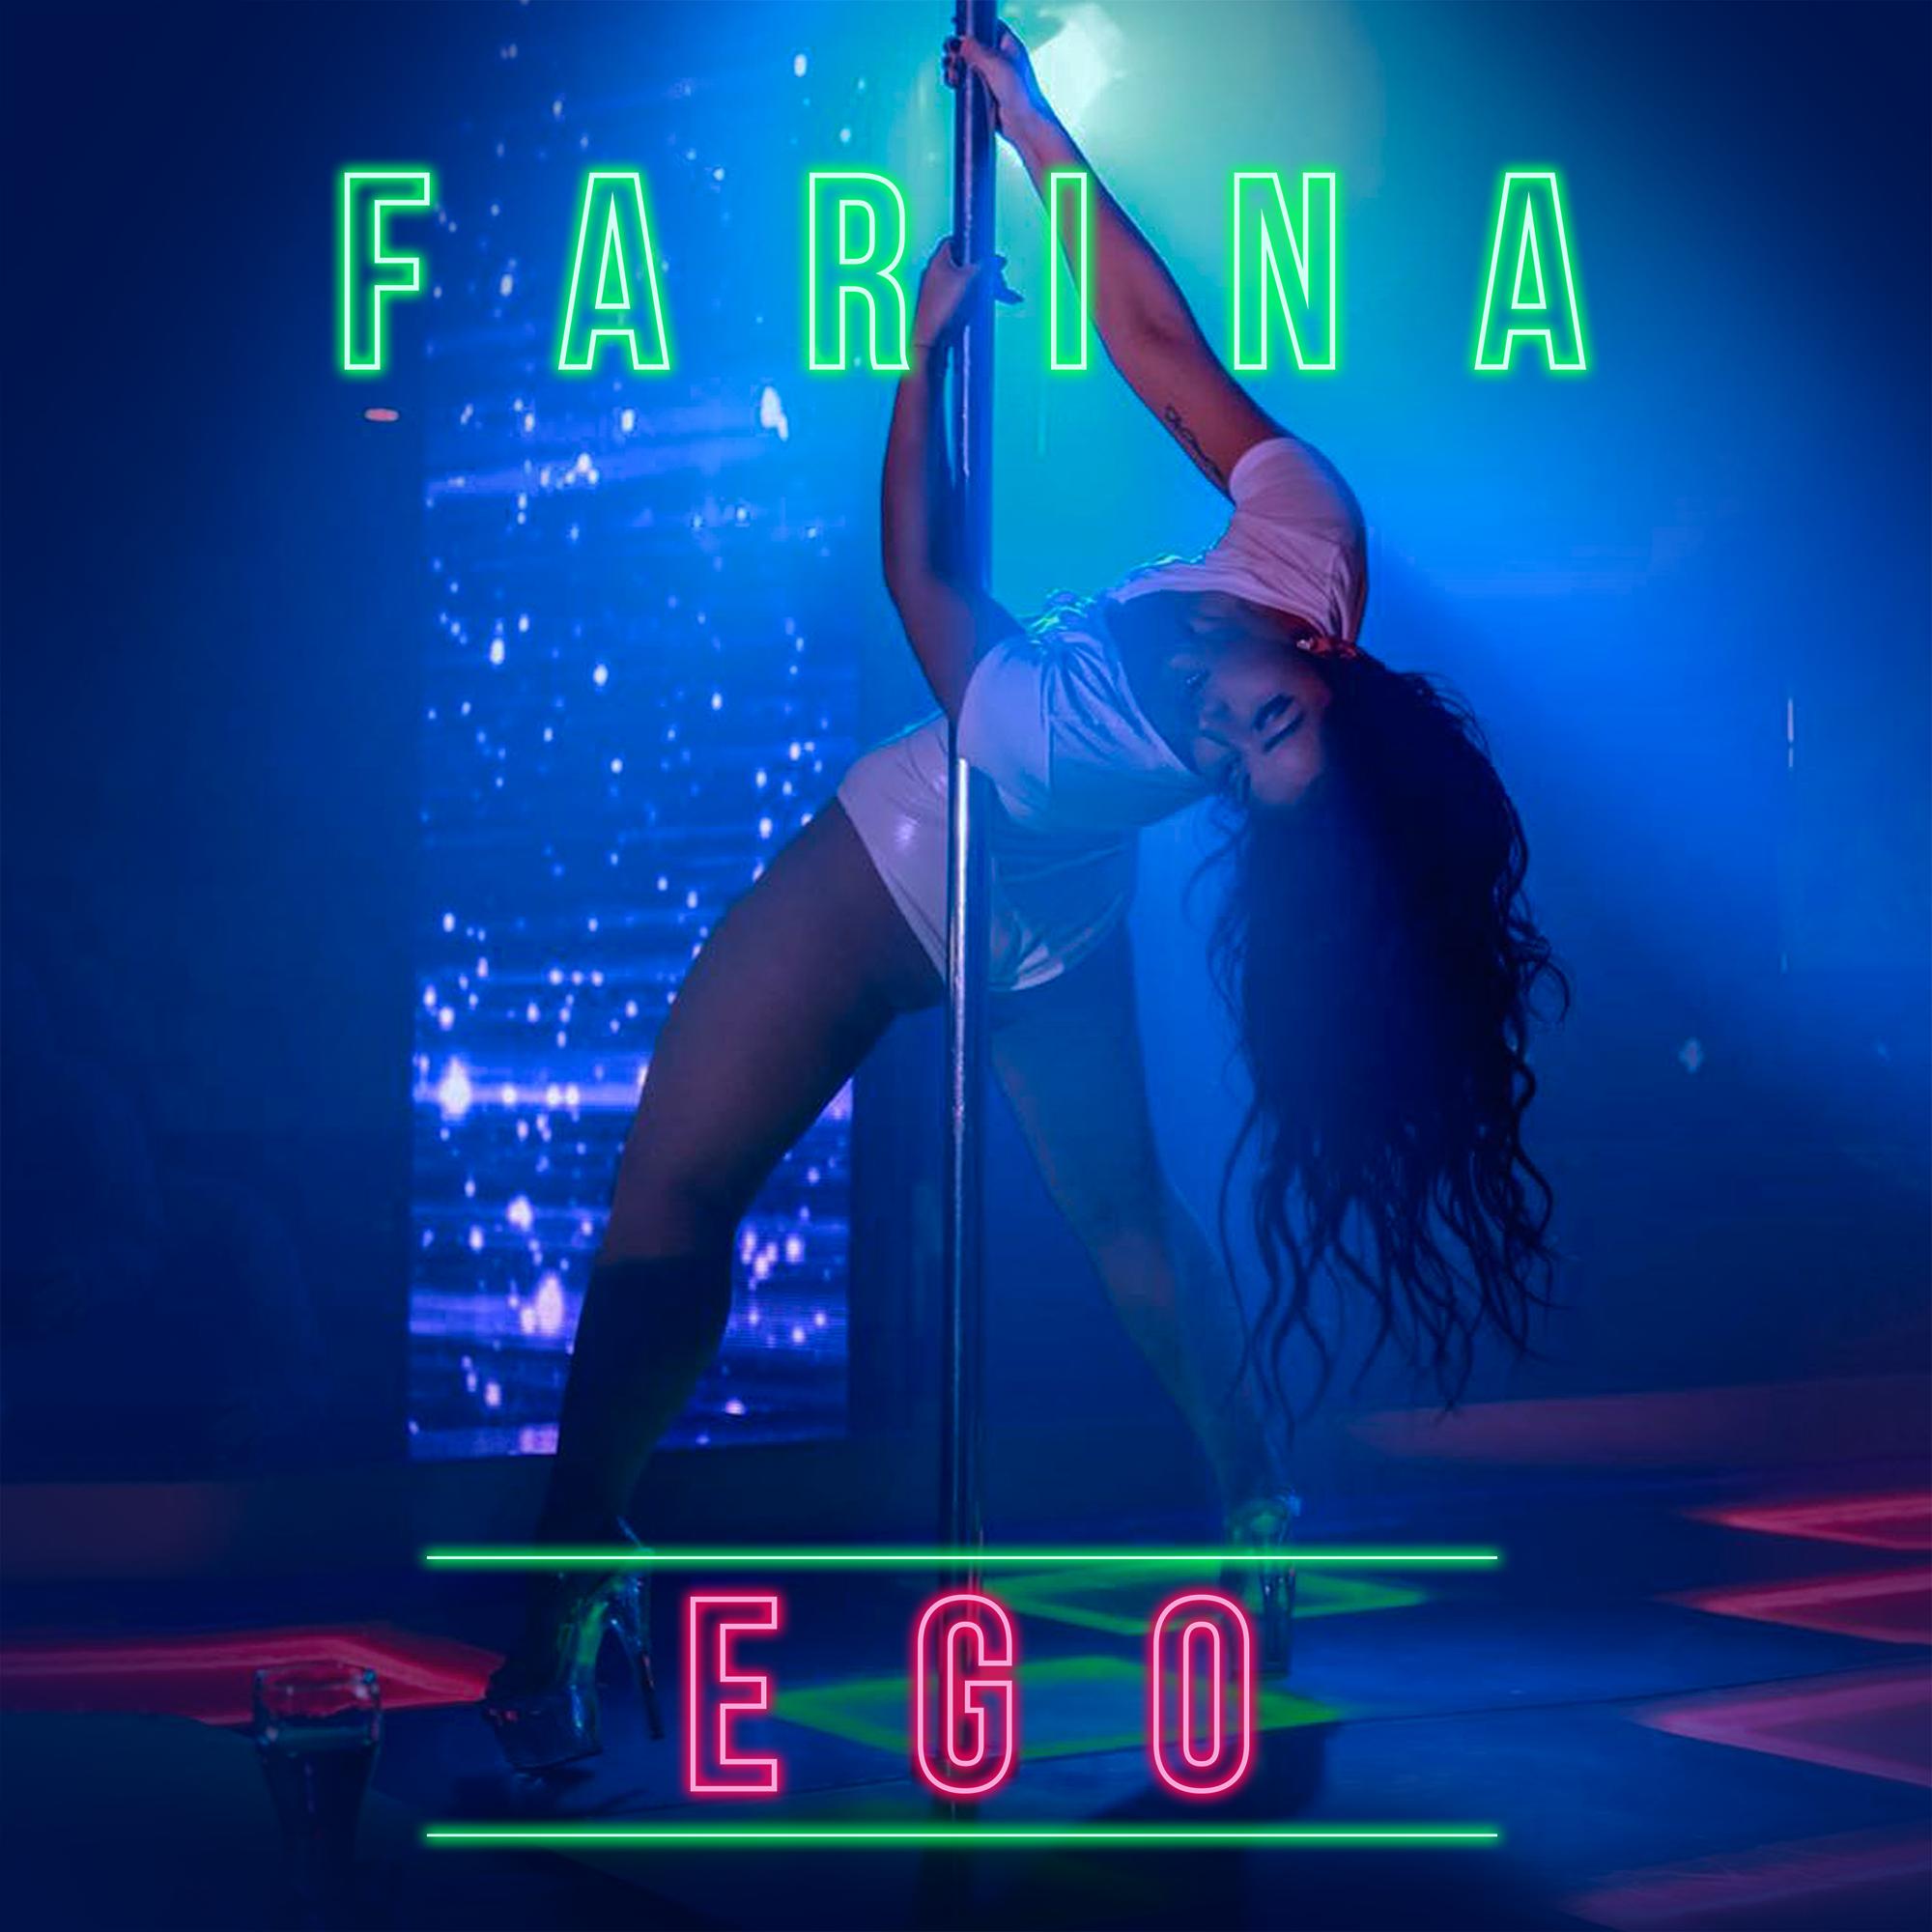 Farina_Ego